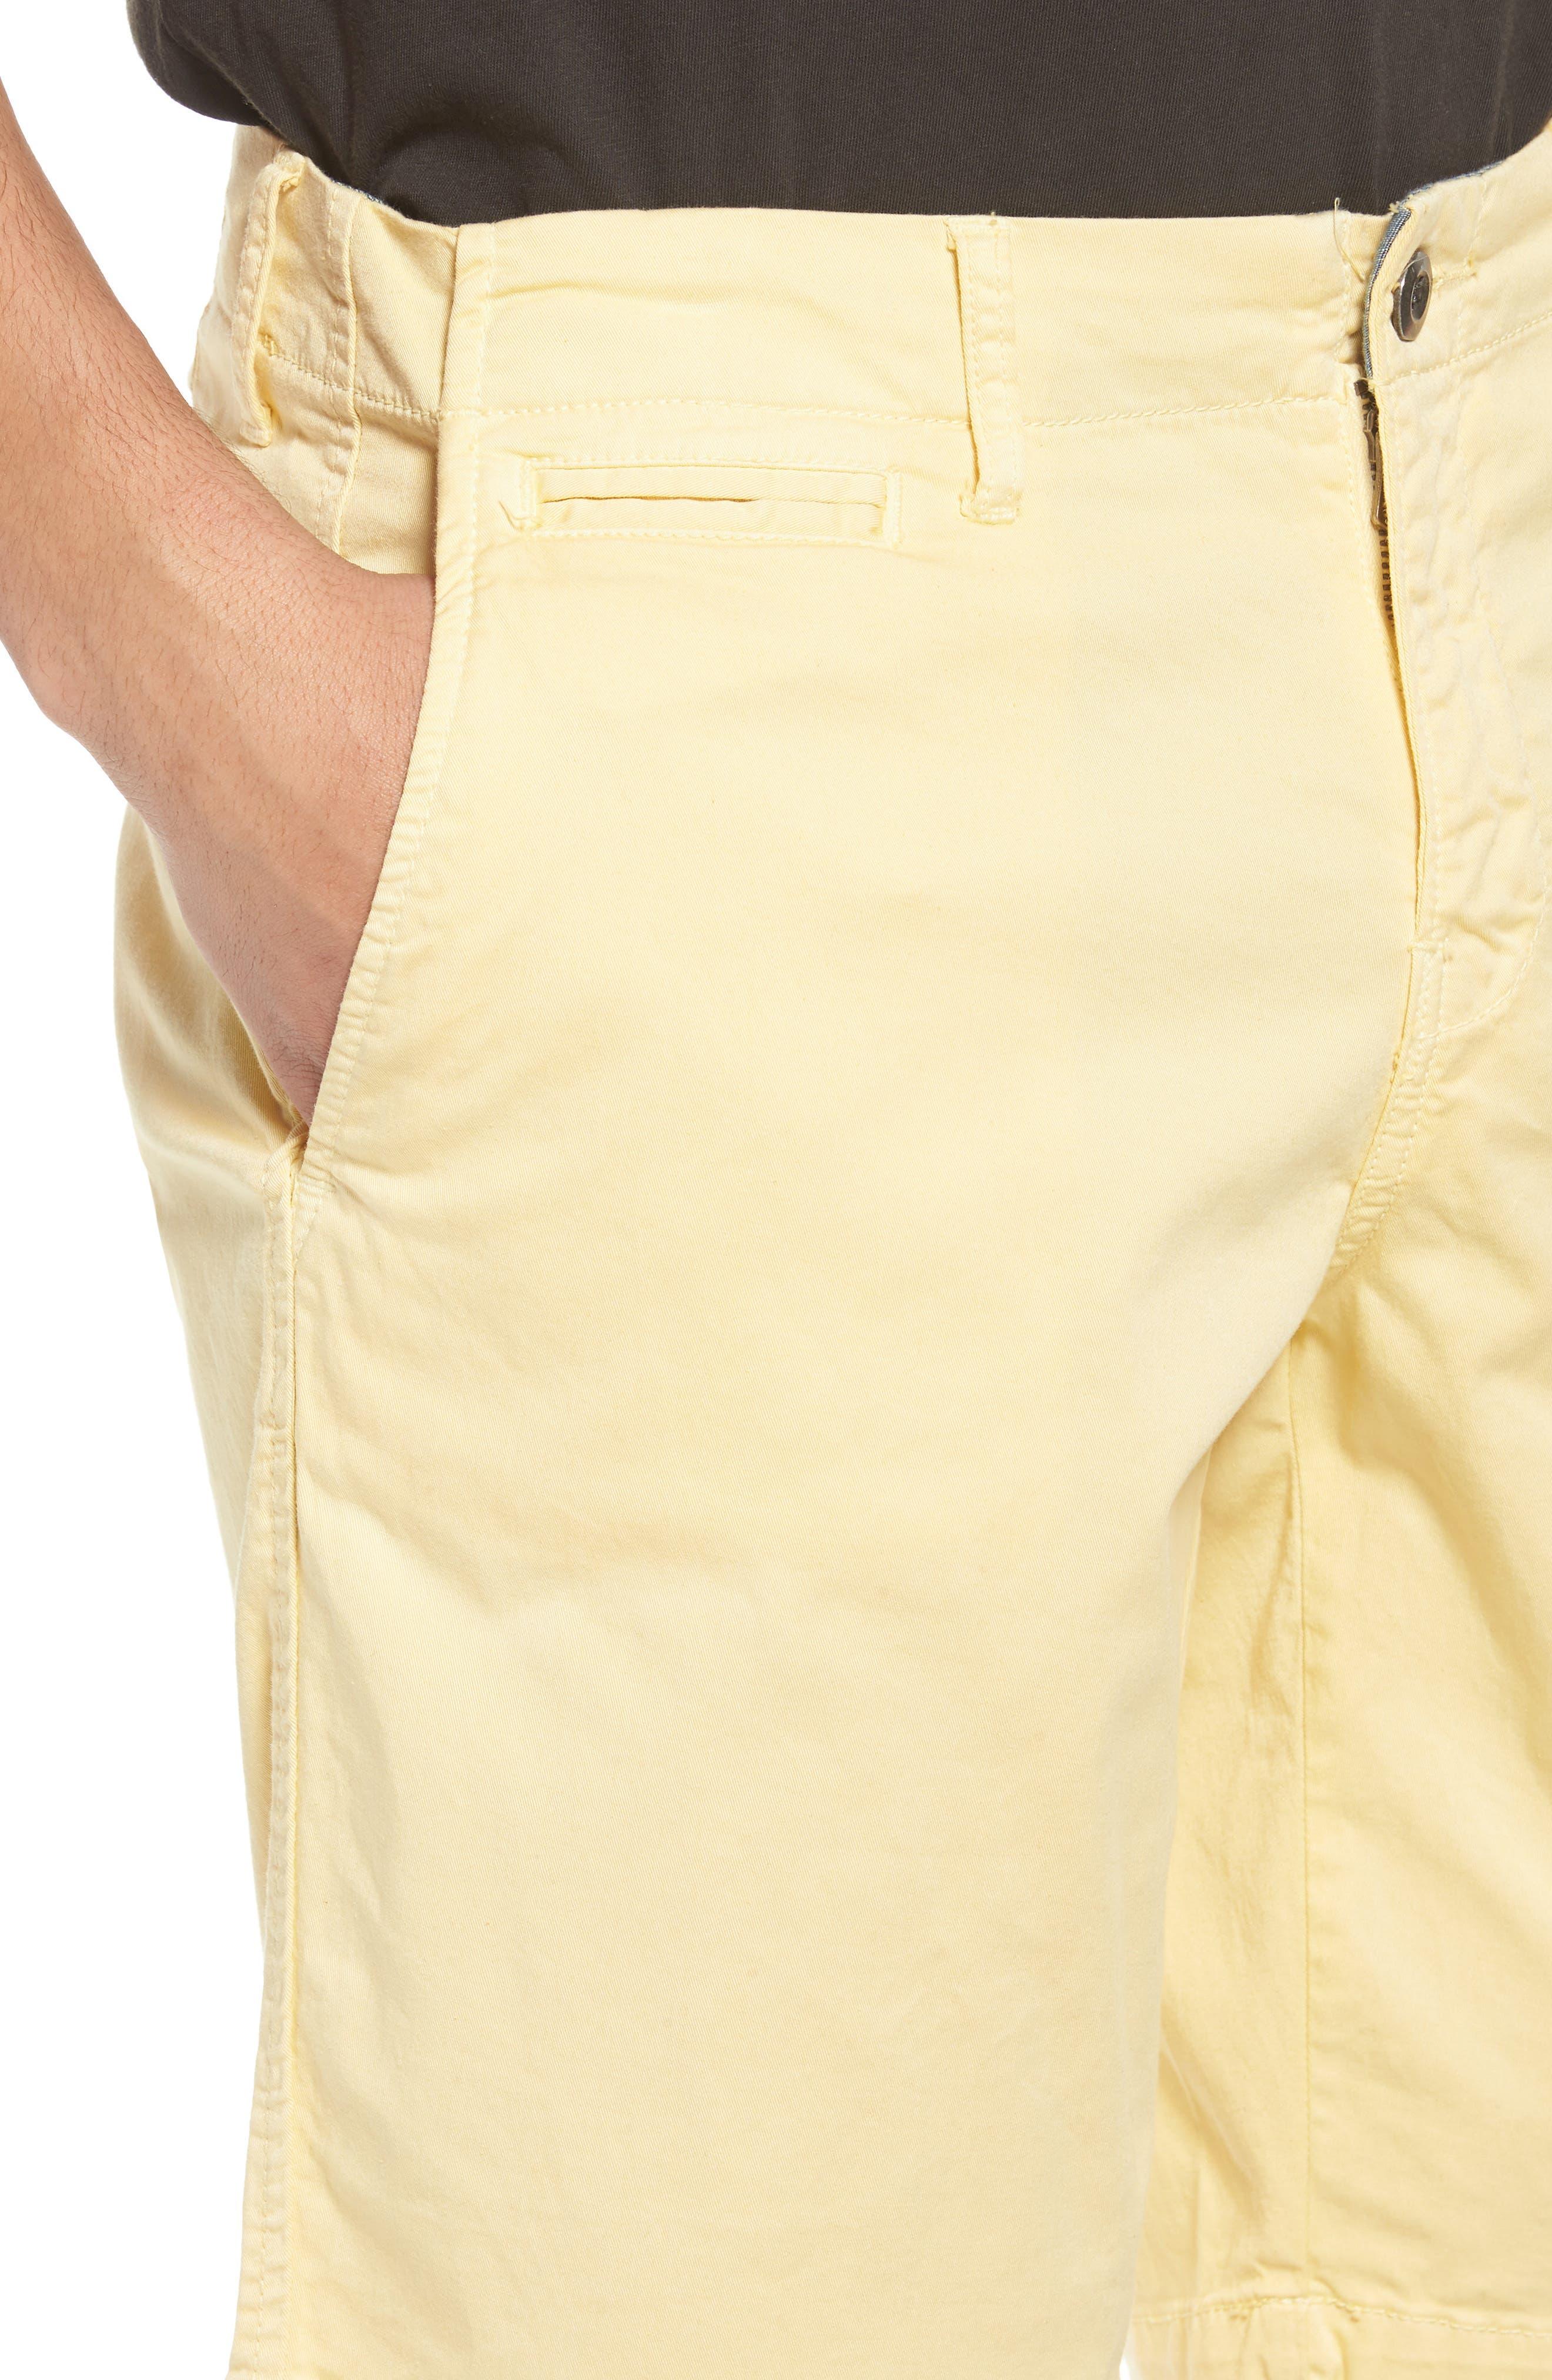 St. Barts Twill Shorts,                             Alternate thumbnail 48, color,